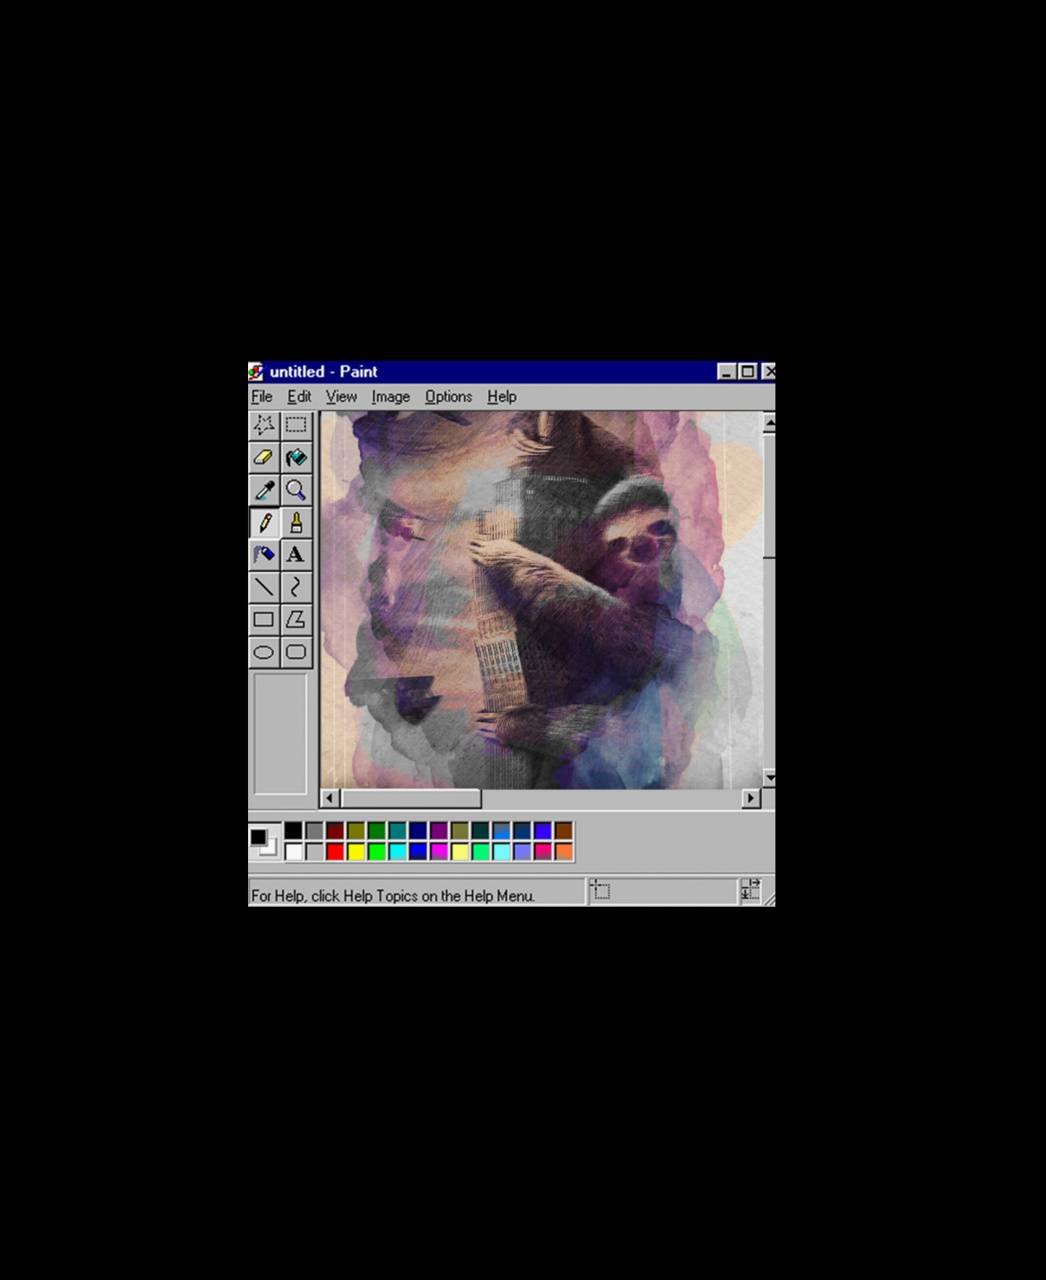 Sloth Editing